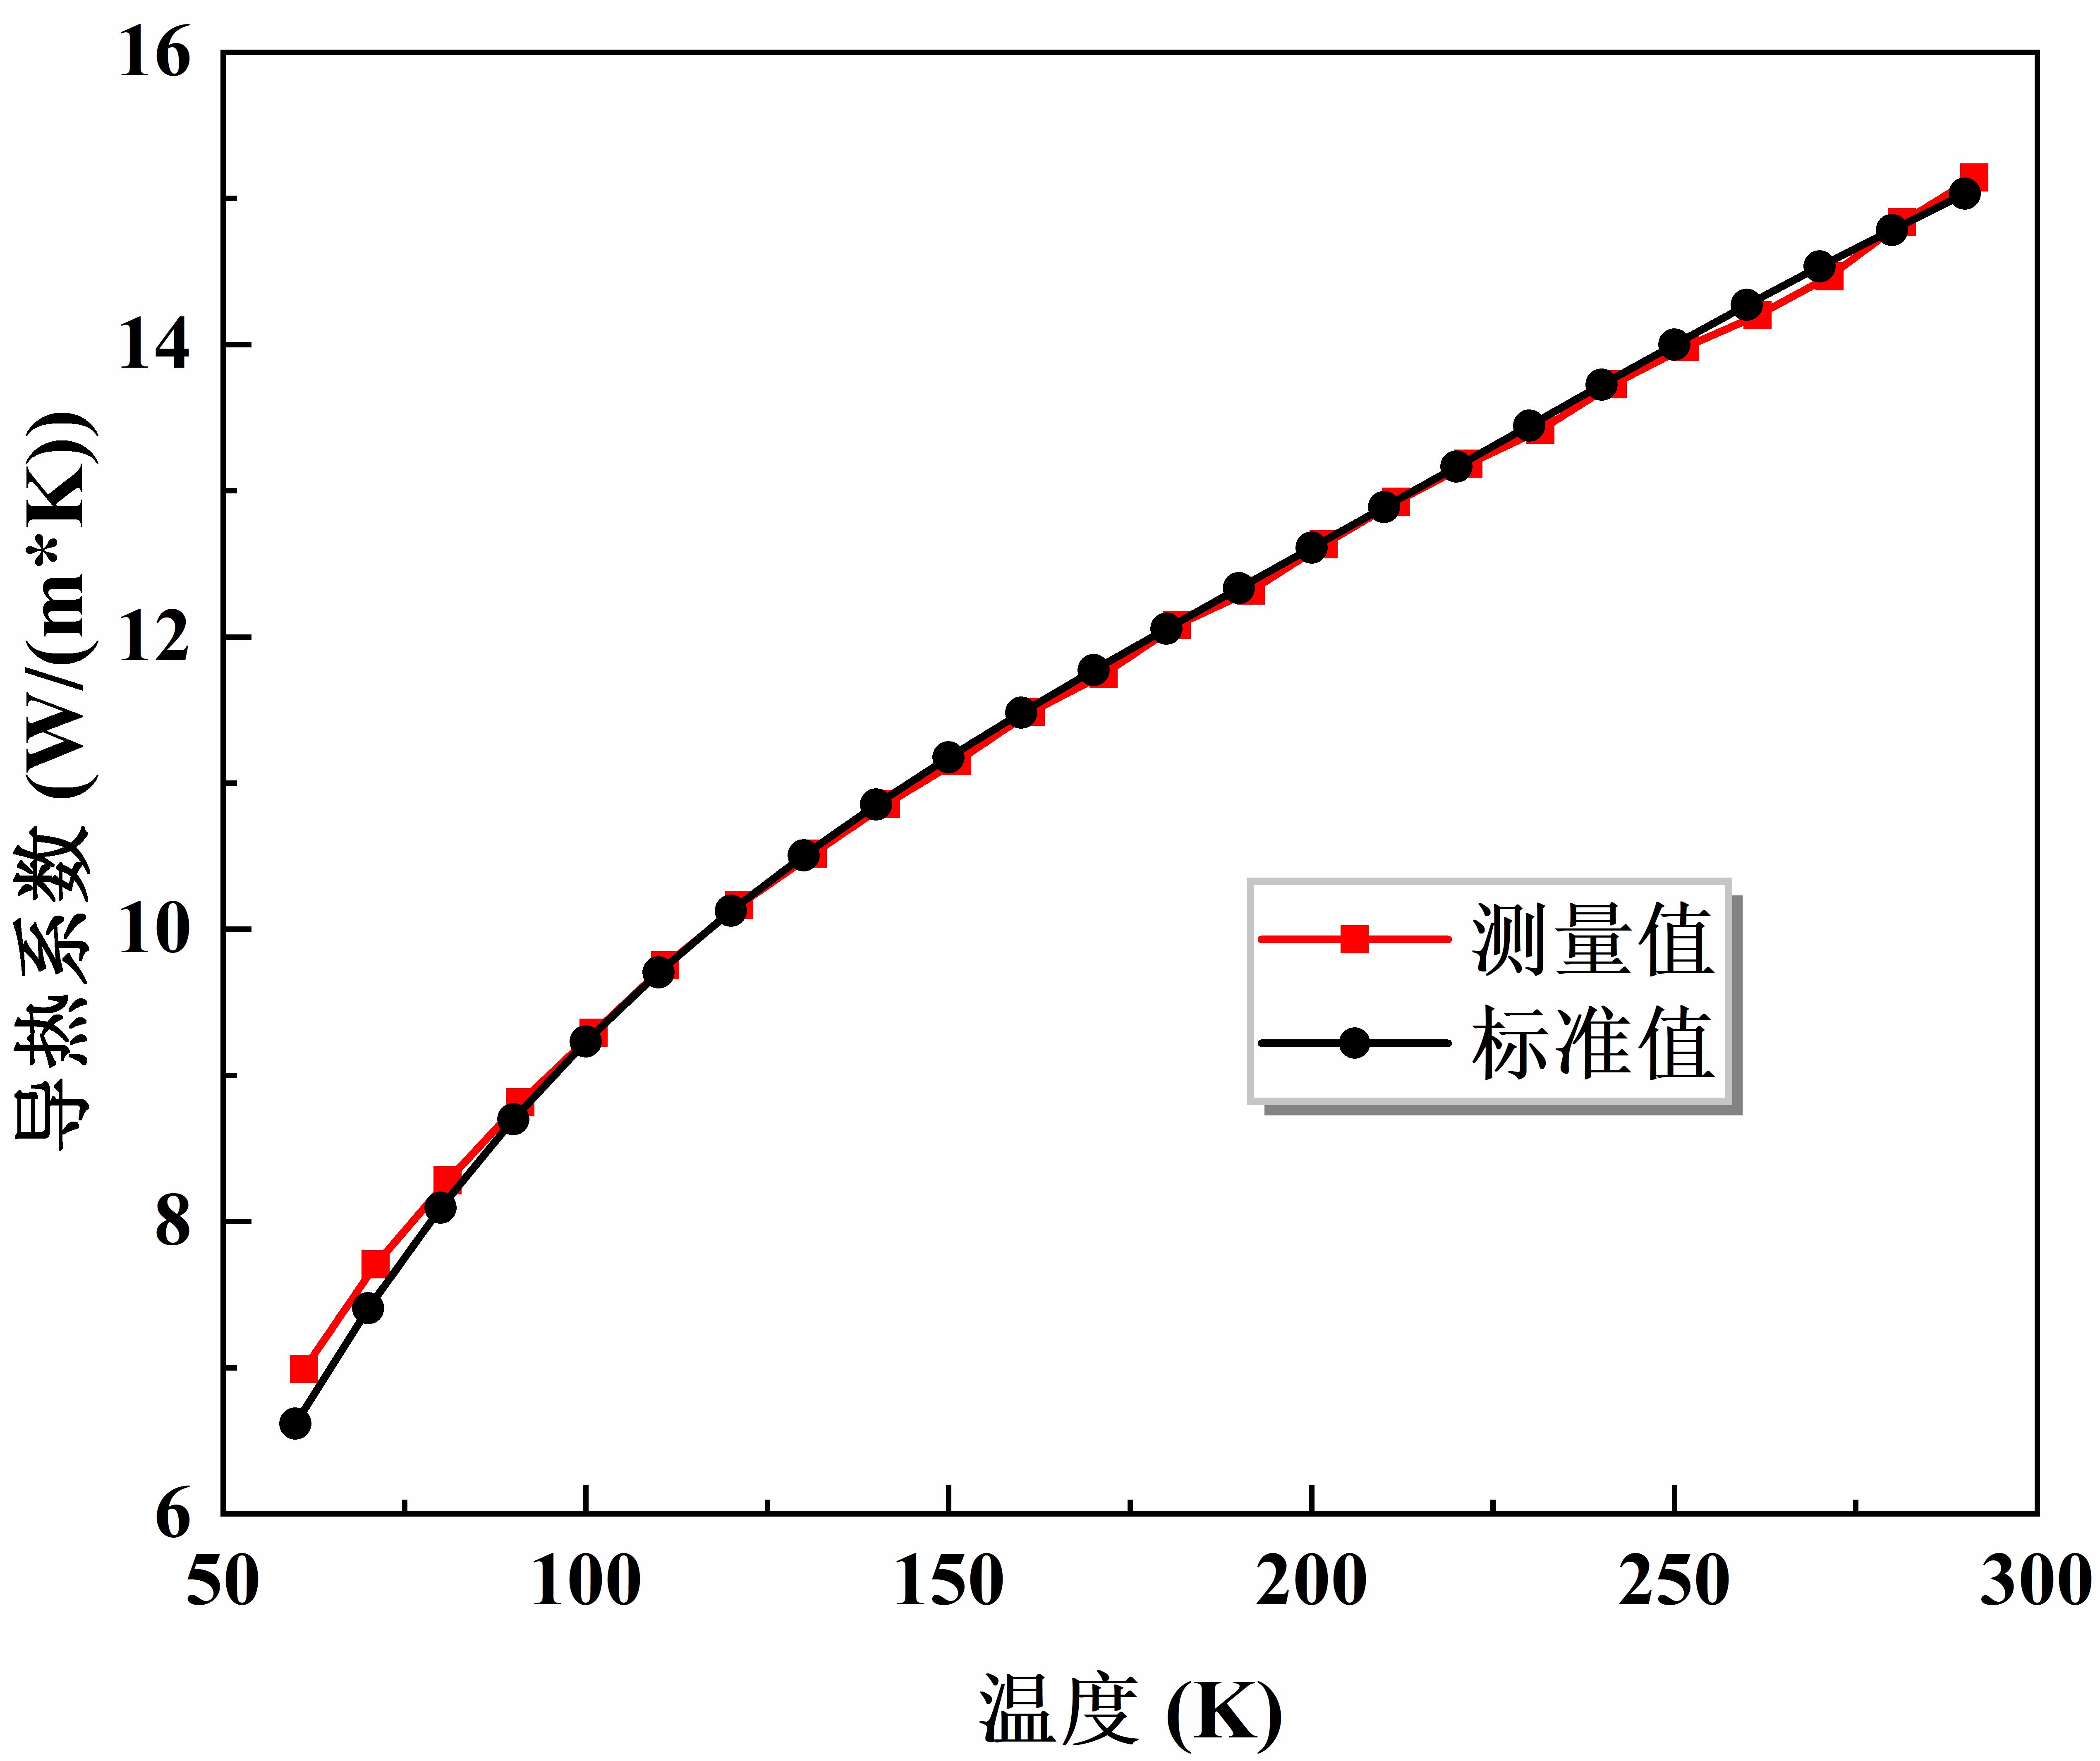 steel 304L 测量值与标准值(1).tif